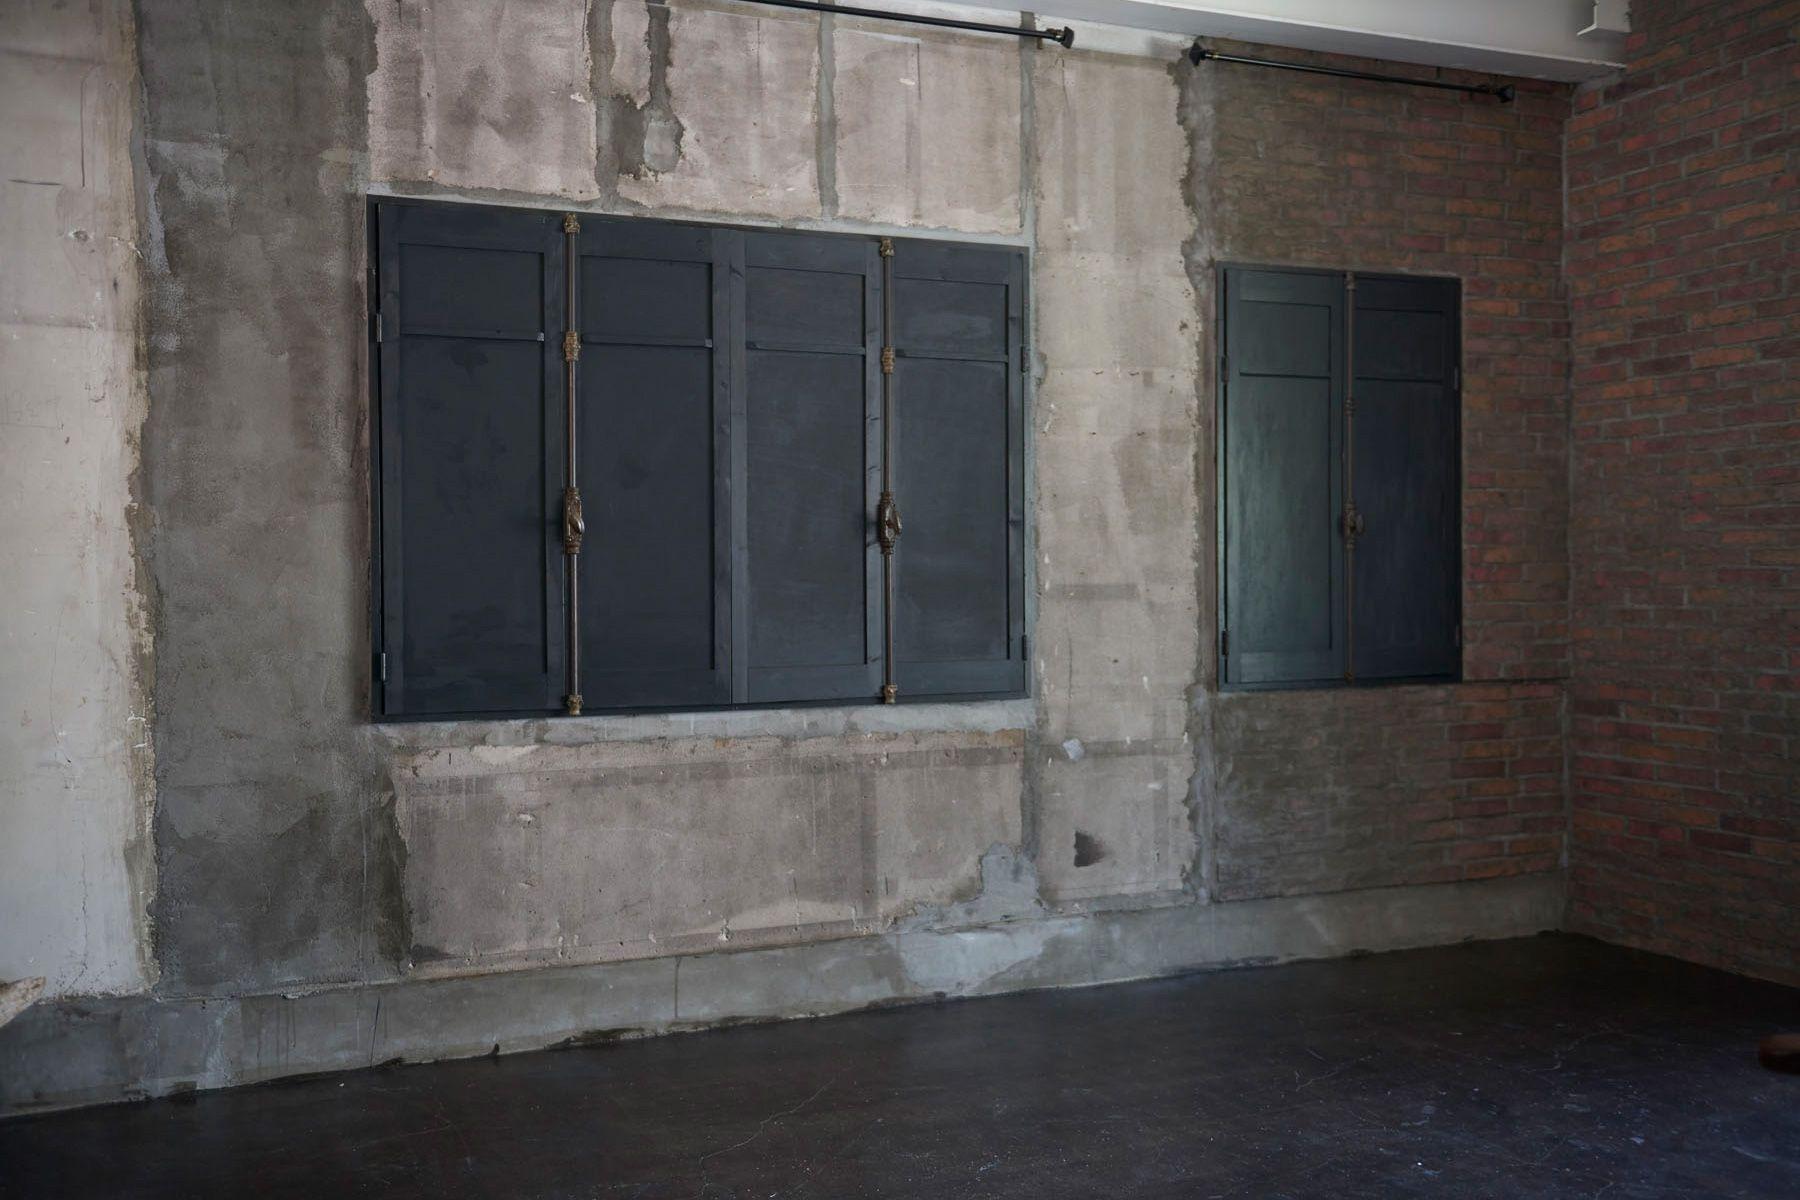 STUDIO FOGLIA 1st (スタジオ フォグリア 1st)グレモン錠の窓